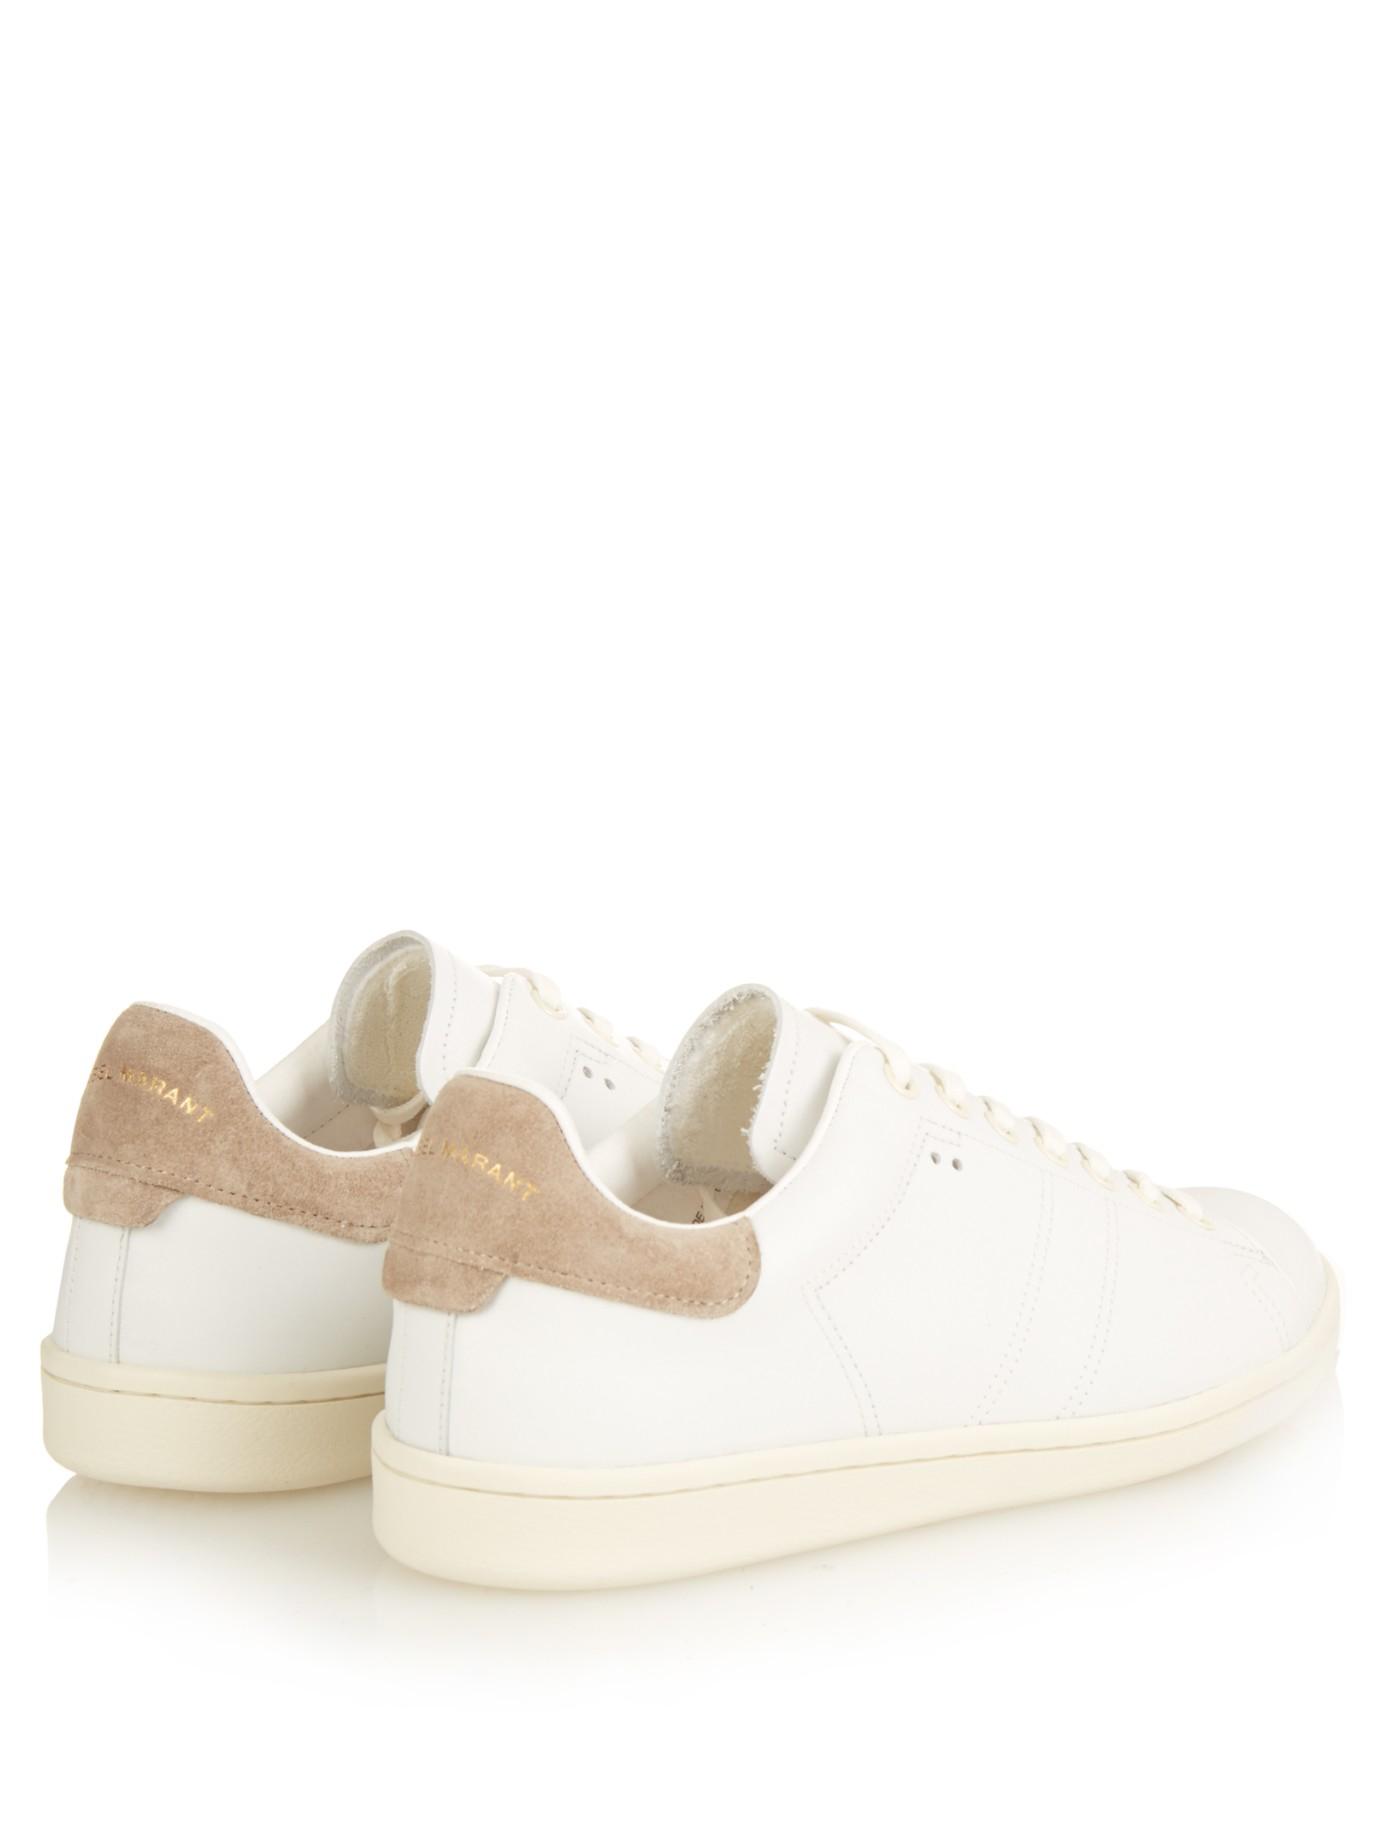 e39fe4c70de Isabel Marant Sneakers White Leather - George's Blog